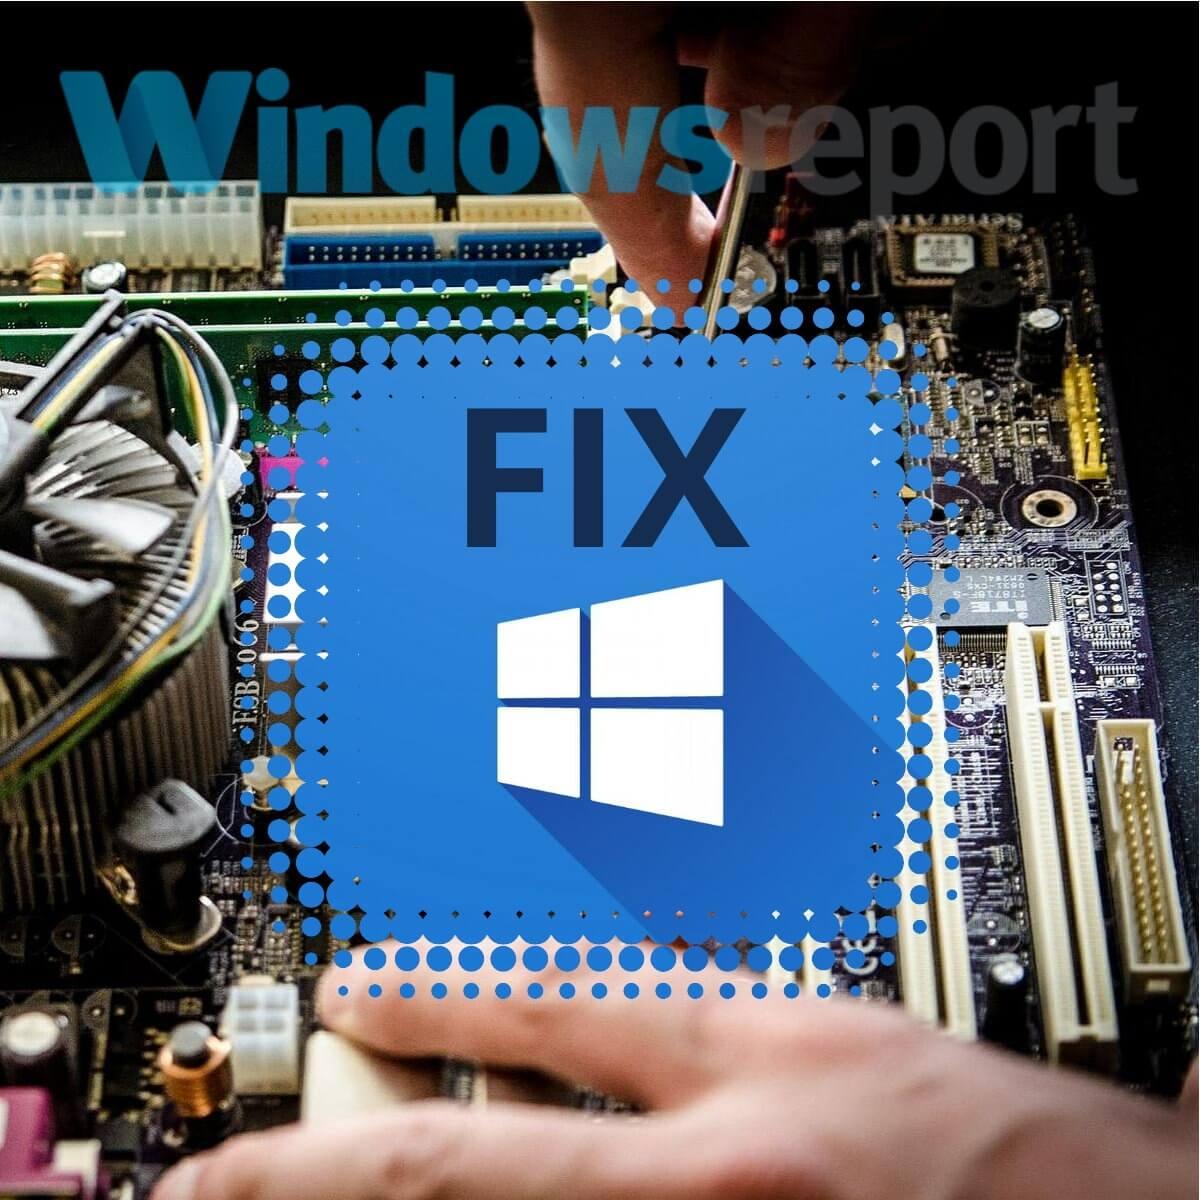 CỐ ĐỊNH: Lỗi VIDEO_TDR_TIMEOUT_DETECTED trong Windows 10 4